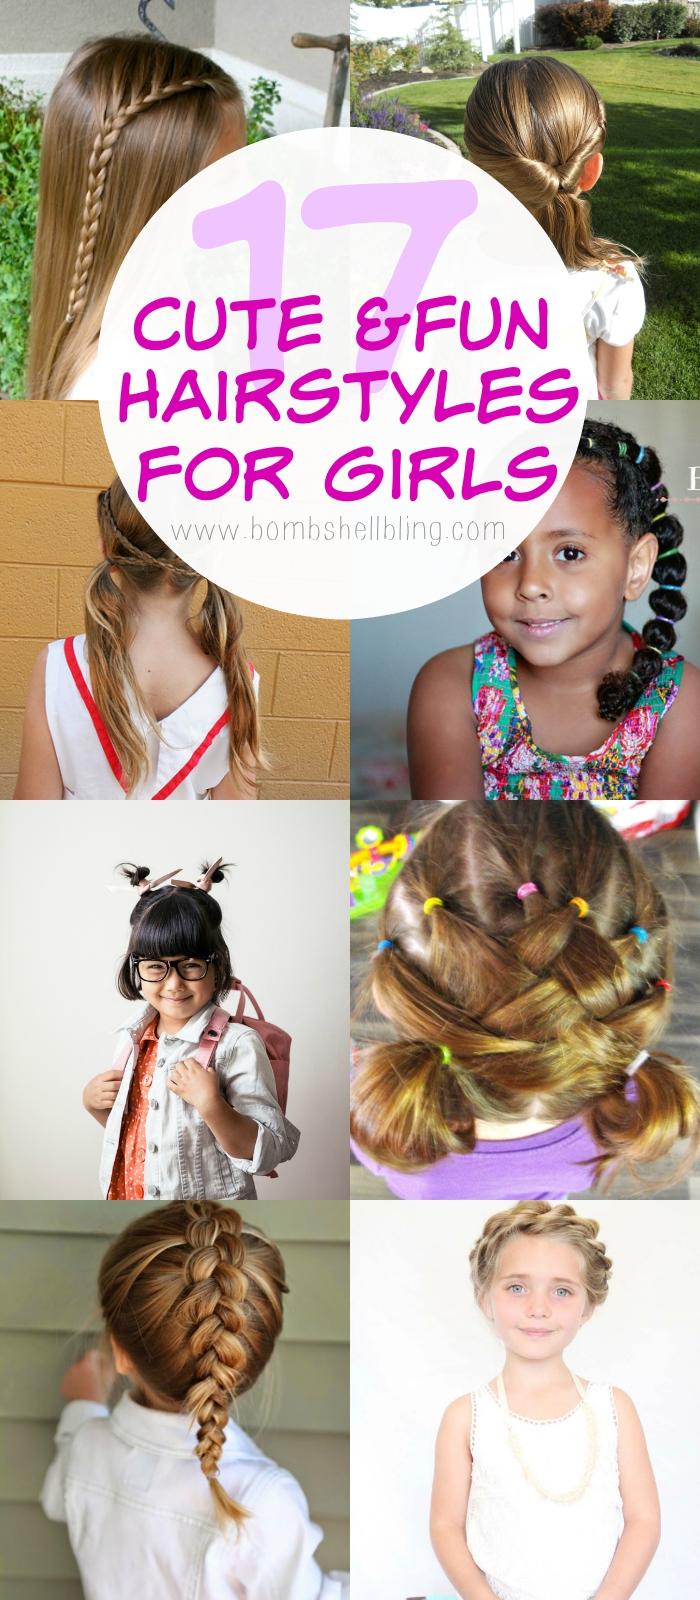 17 Cute & Fun Hairstyles for Girls